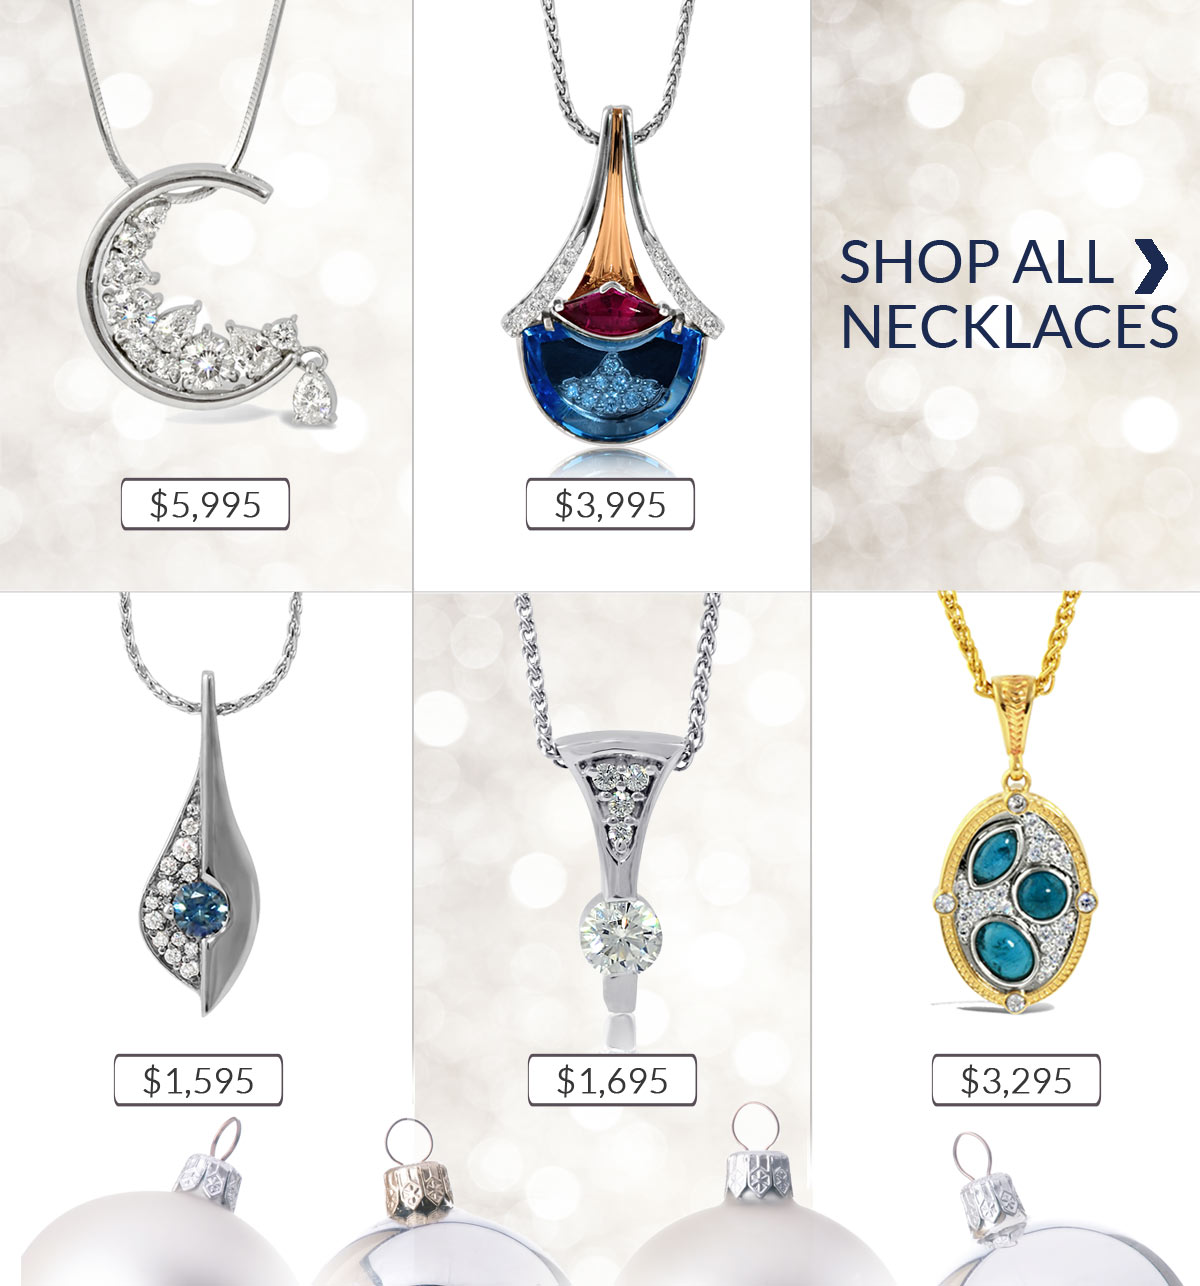 Mark-Michael-Diamond-Designs-Necklace-Collection.jpg